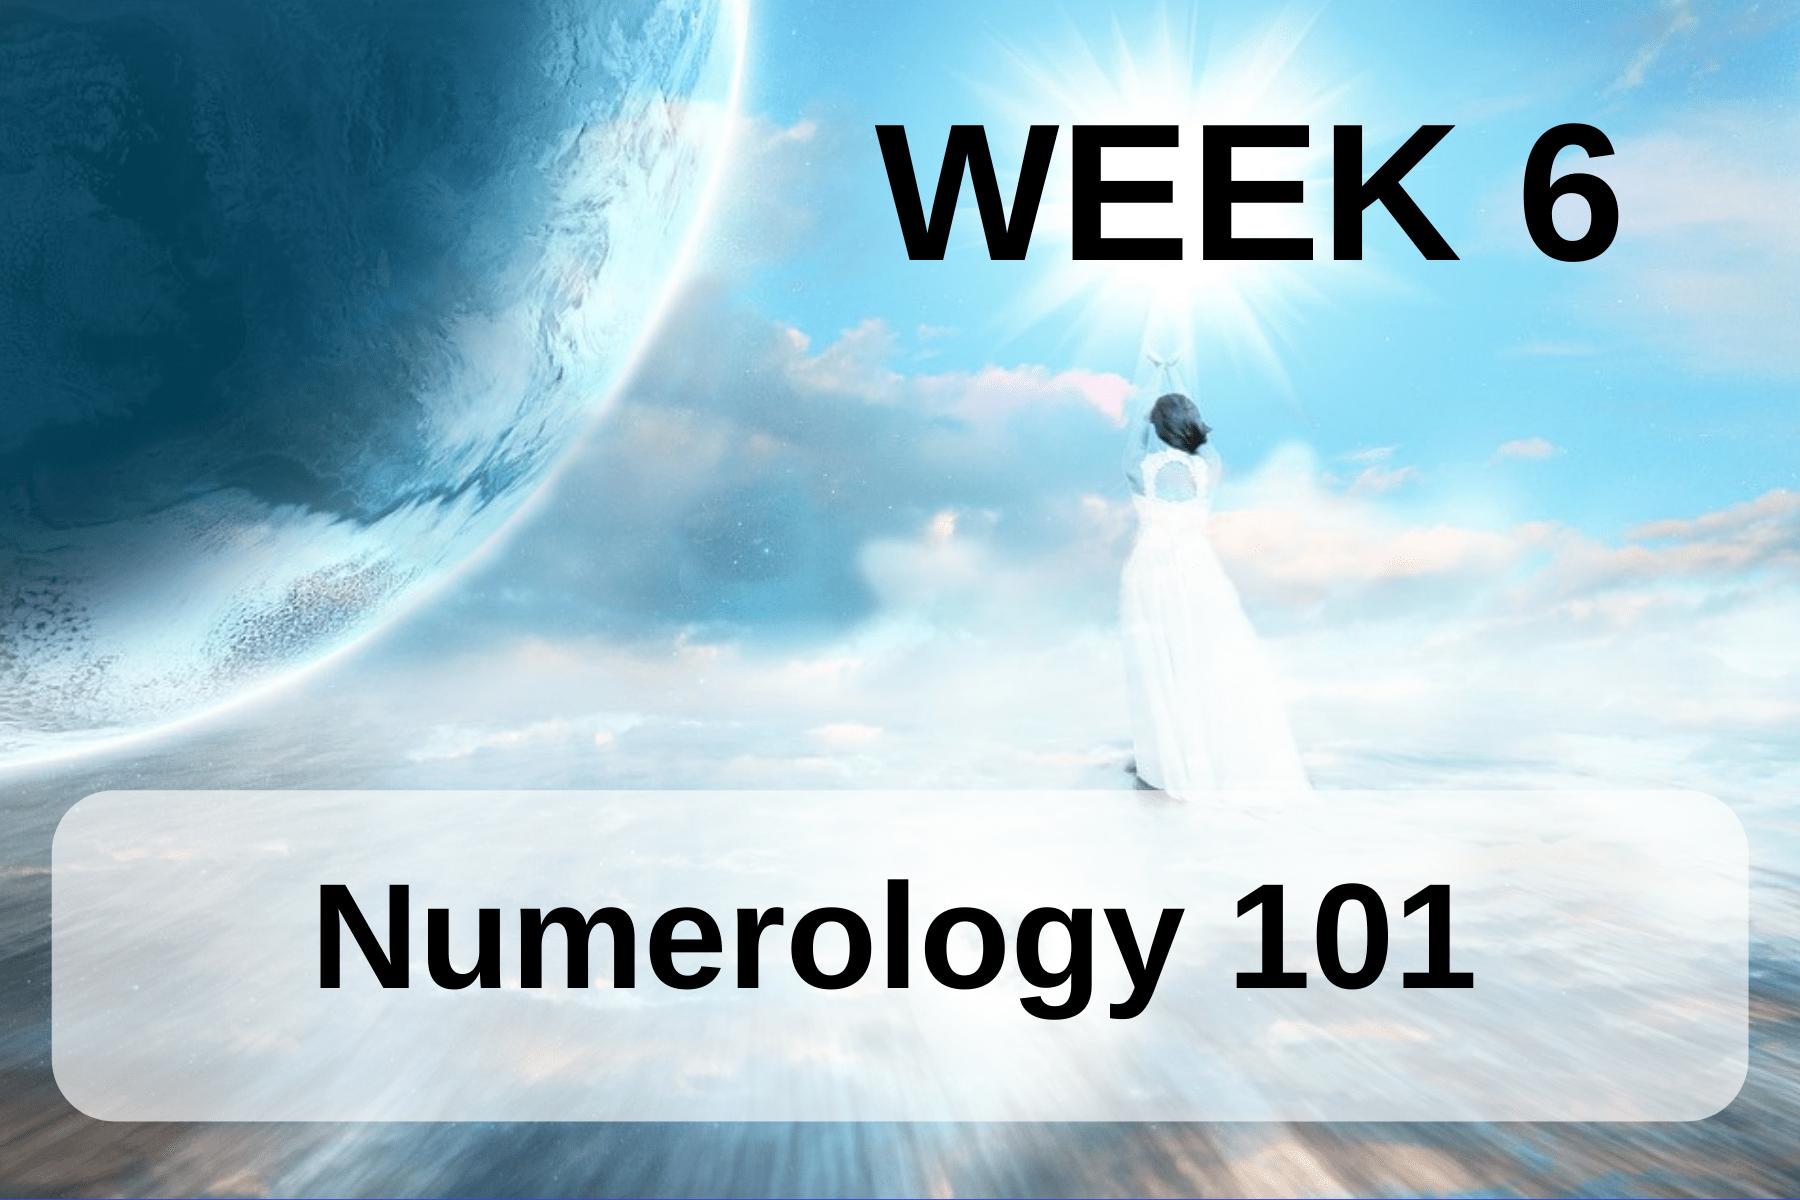 LA Wk 6 Numerology 101 2